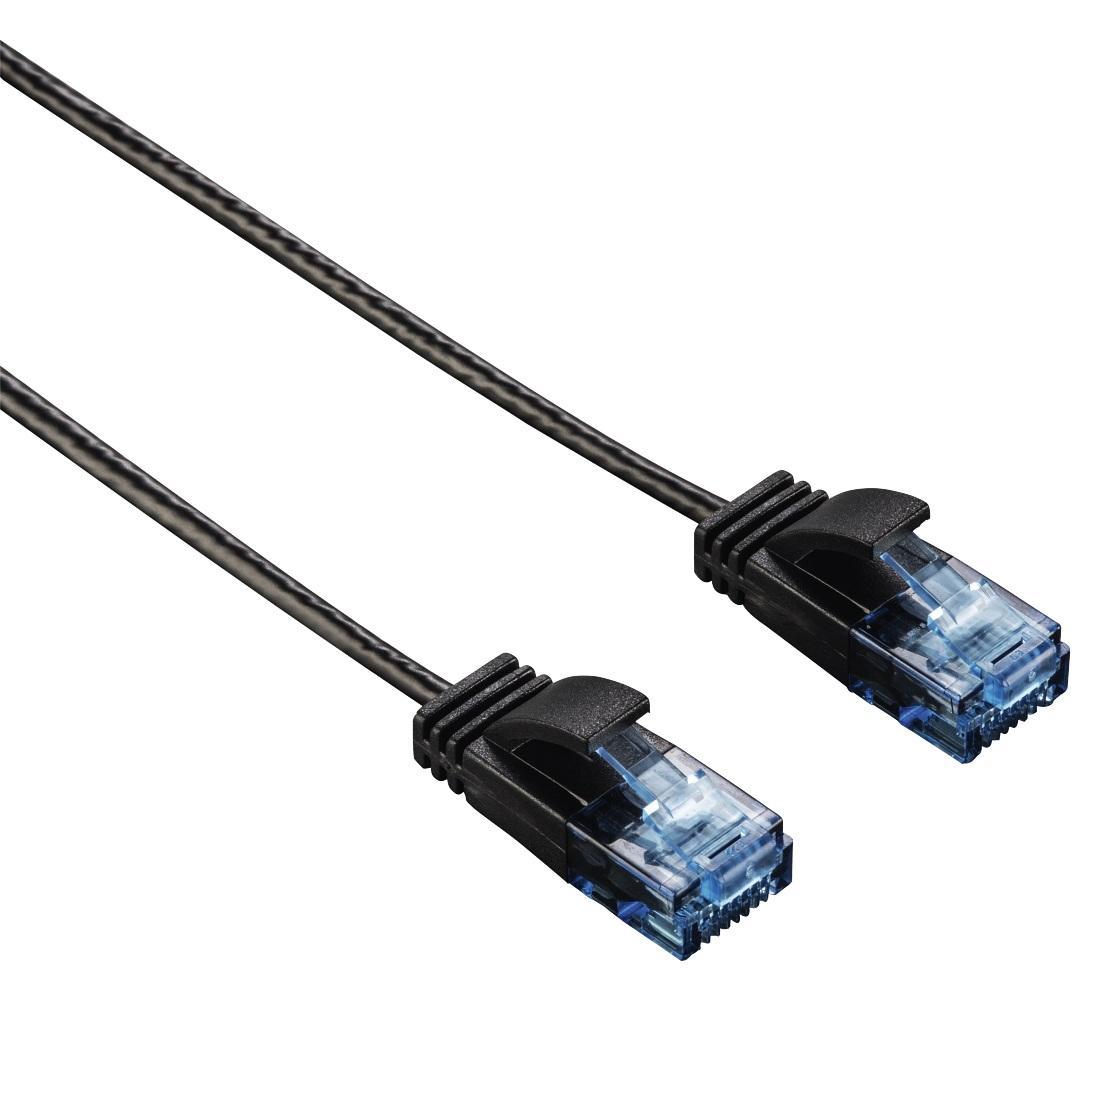 Мрежов кабел HAMA Slim-Flexible, CAT-6, UTP, RJ-45 - RJ-45, 1.5м, Черен